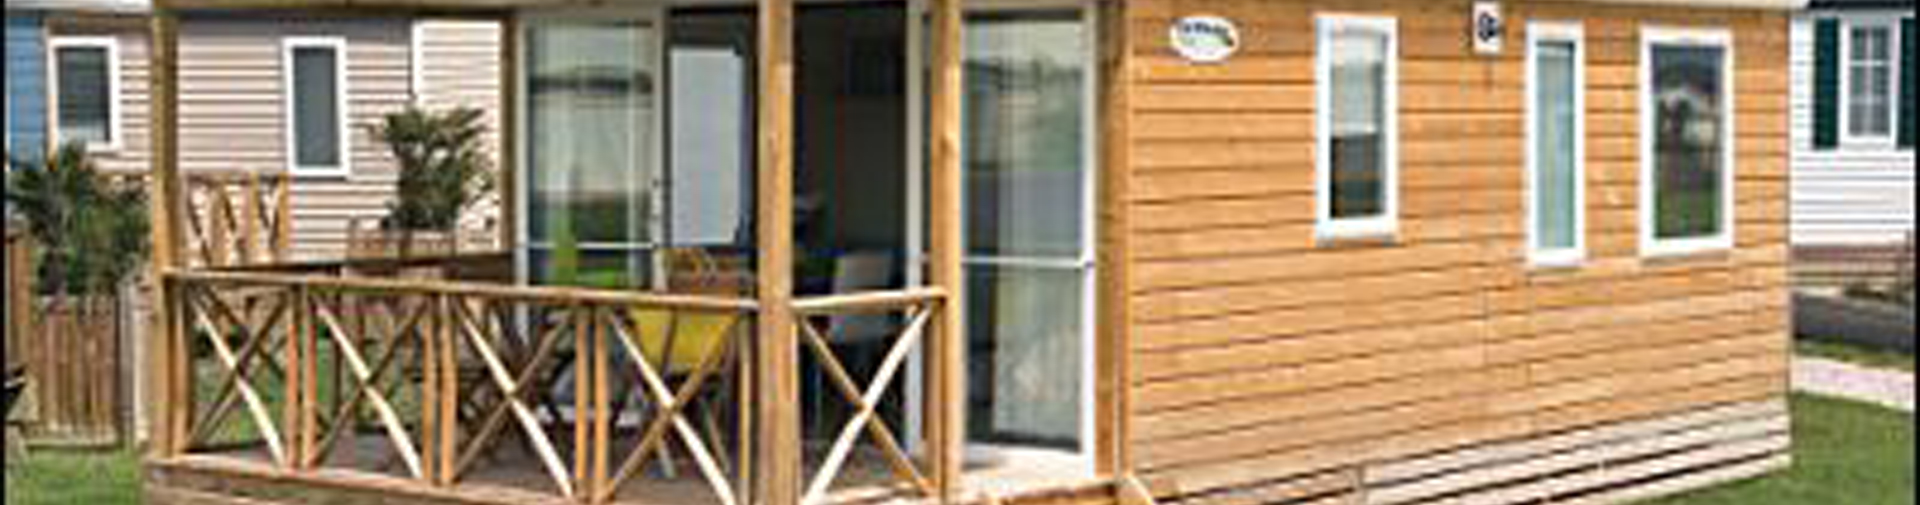 location mobil-home 4p terrasse couverte Oléron